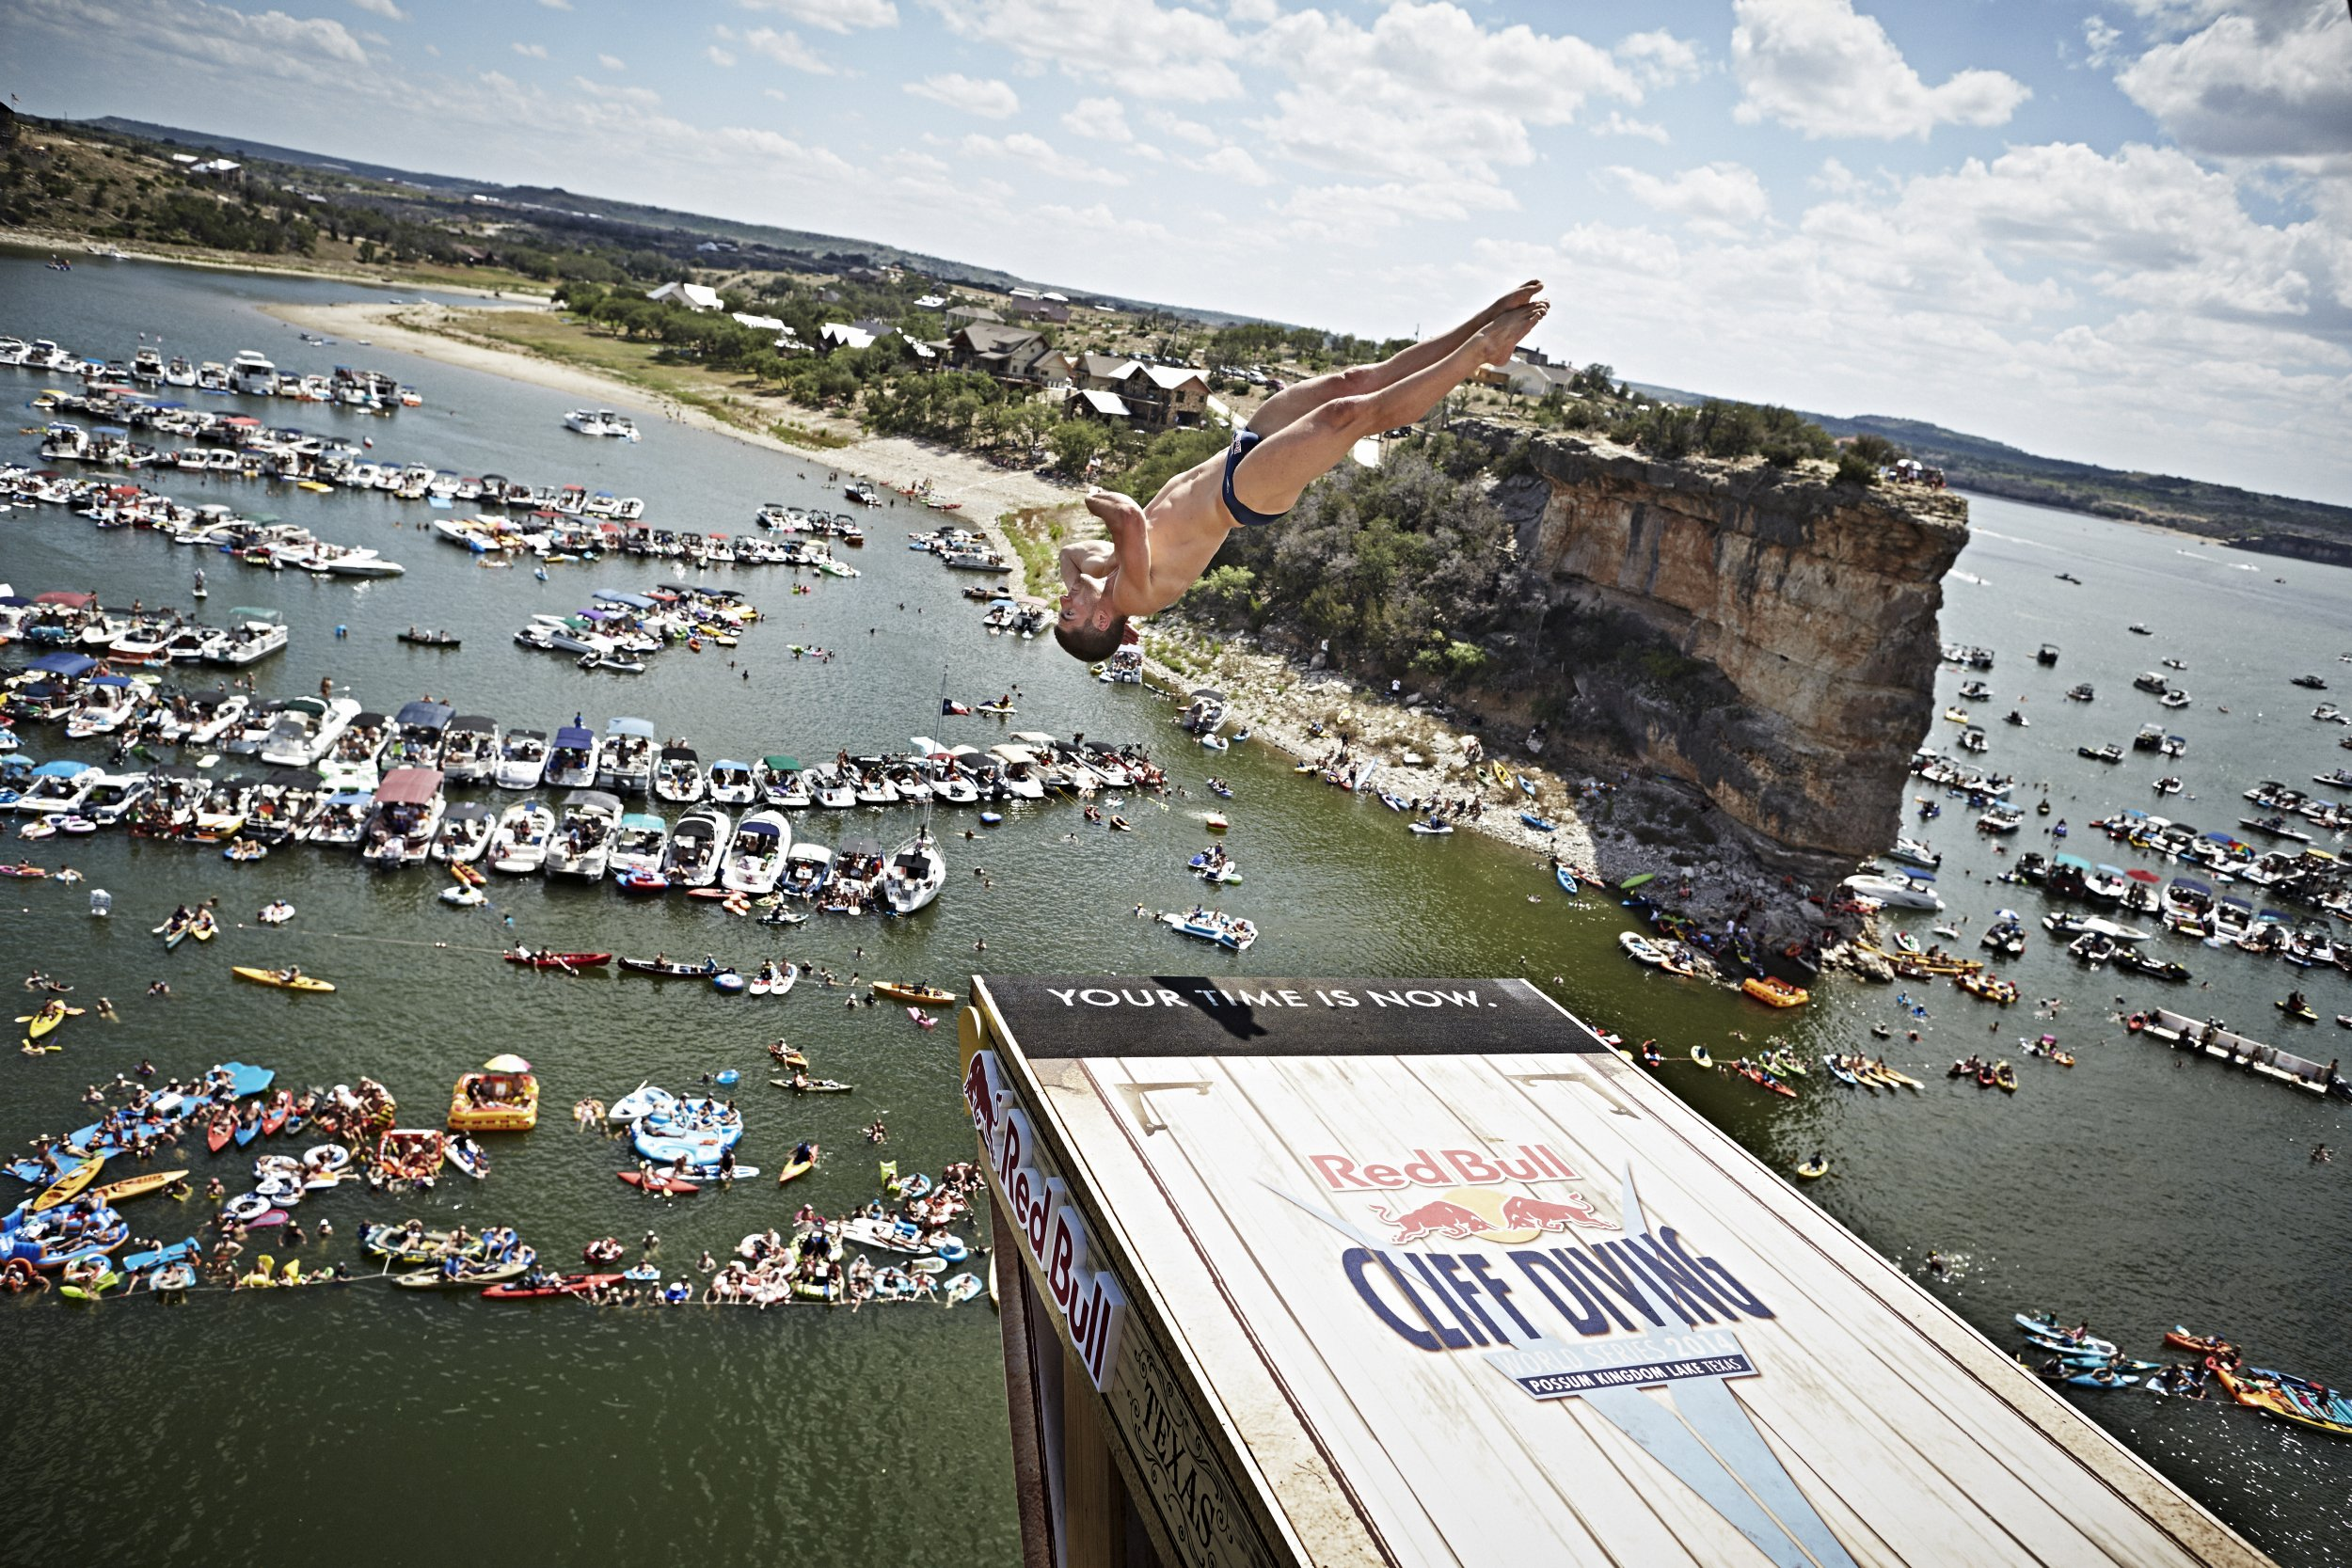 Cliff diver David Colturi photographed by Balazs Gardi